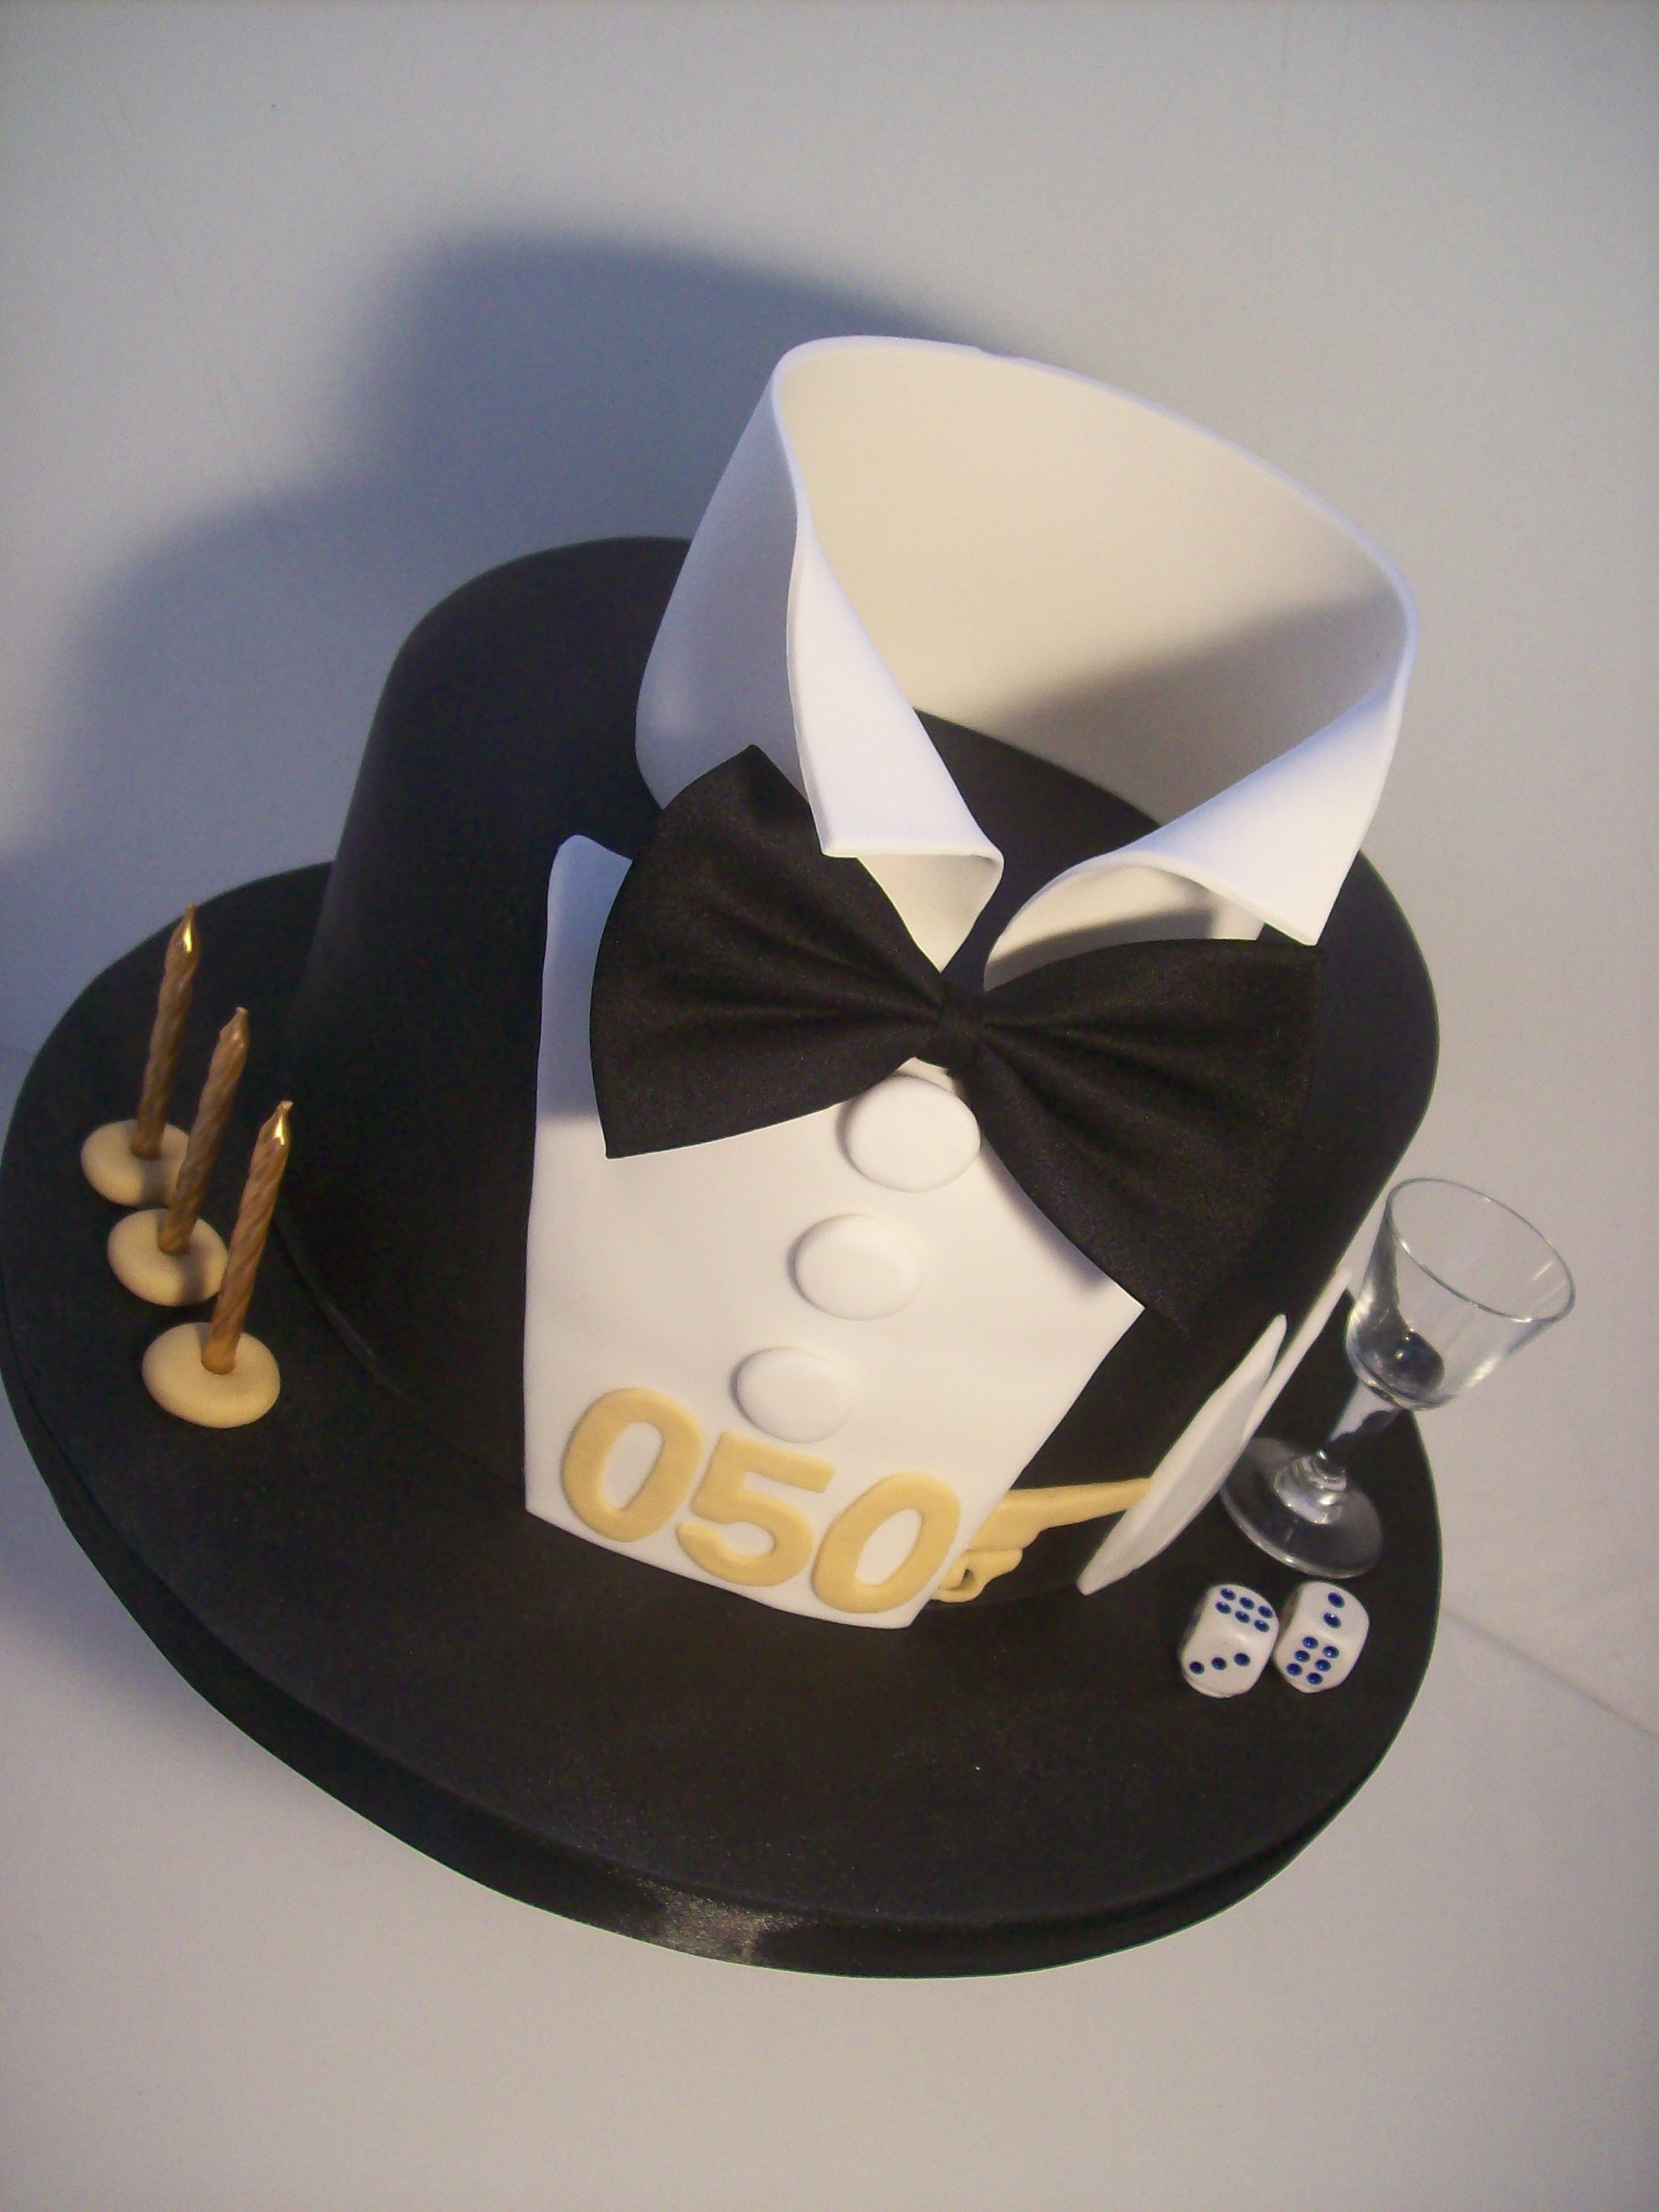 James Bond Cake 259 Temptation Cakes Temptation Cakes